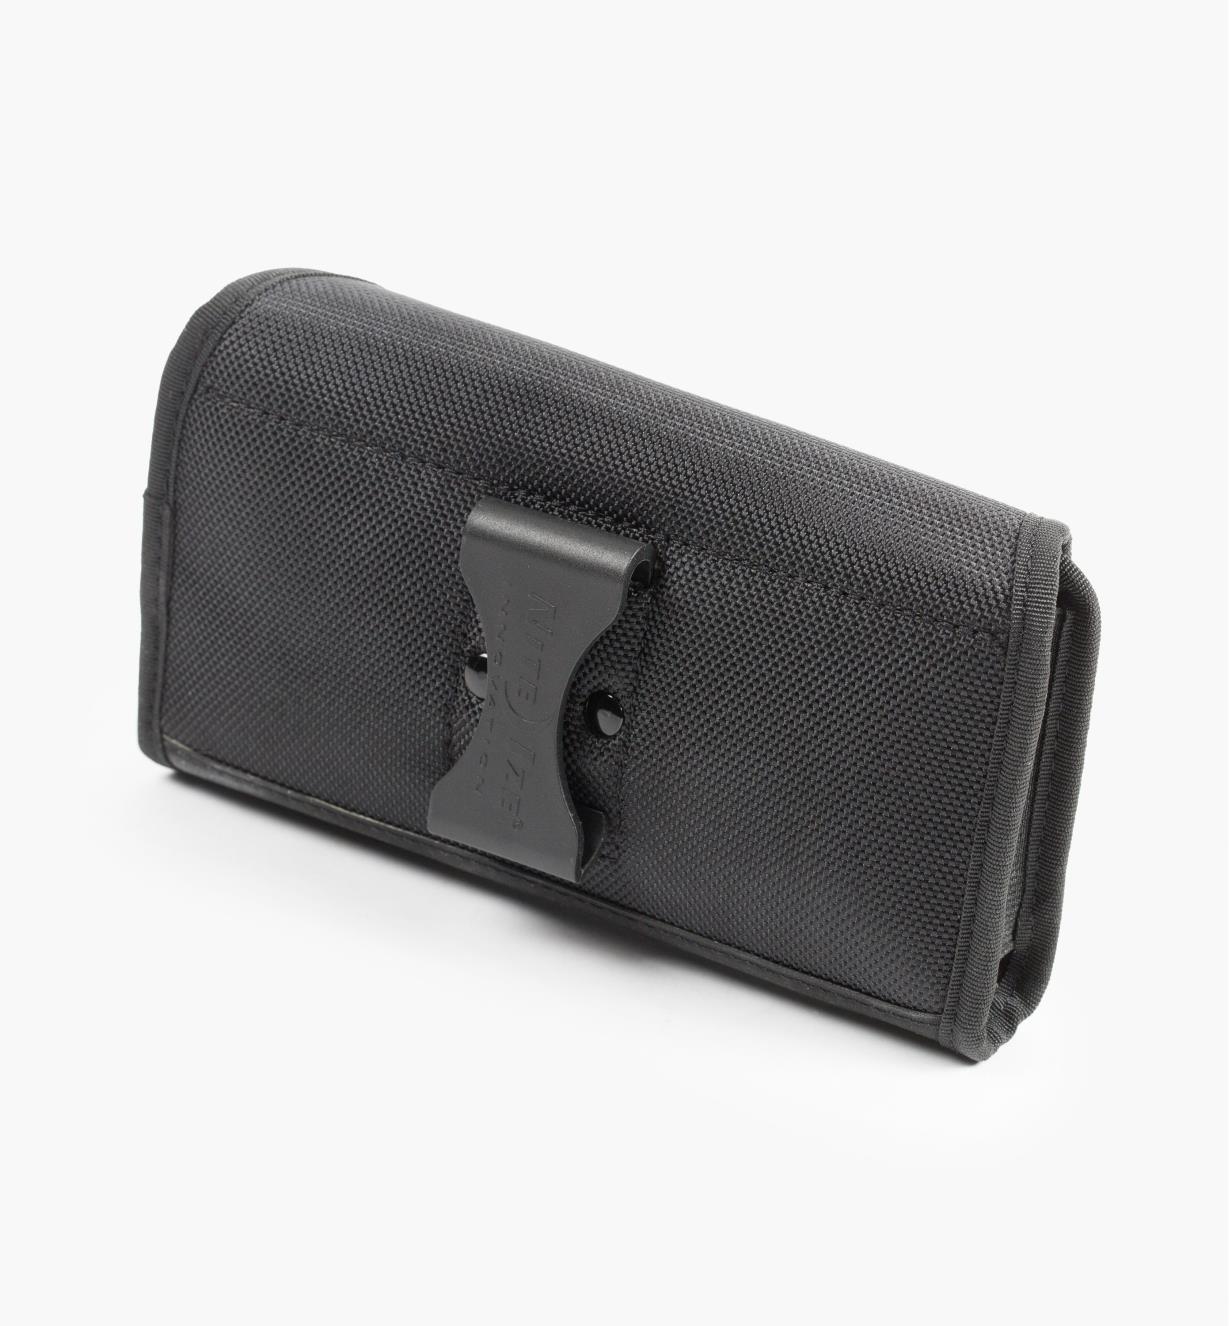 68K0638 - Large Smartphone Clip Case, Horizontal Style